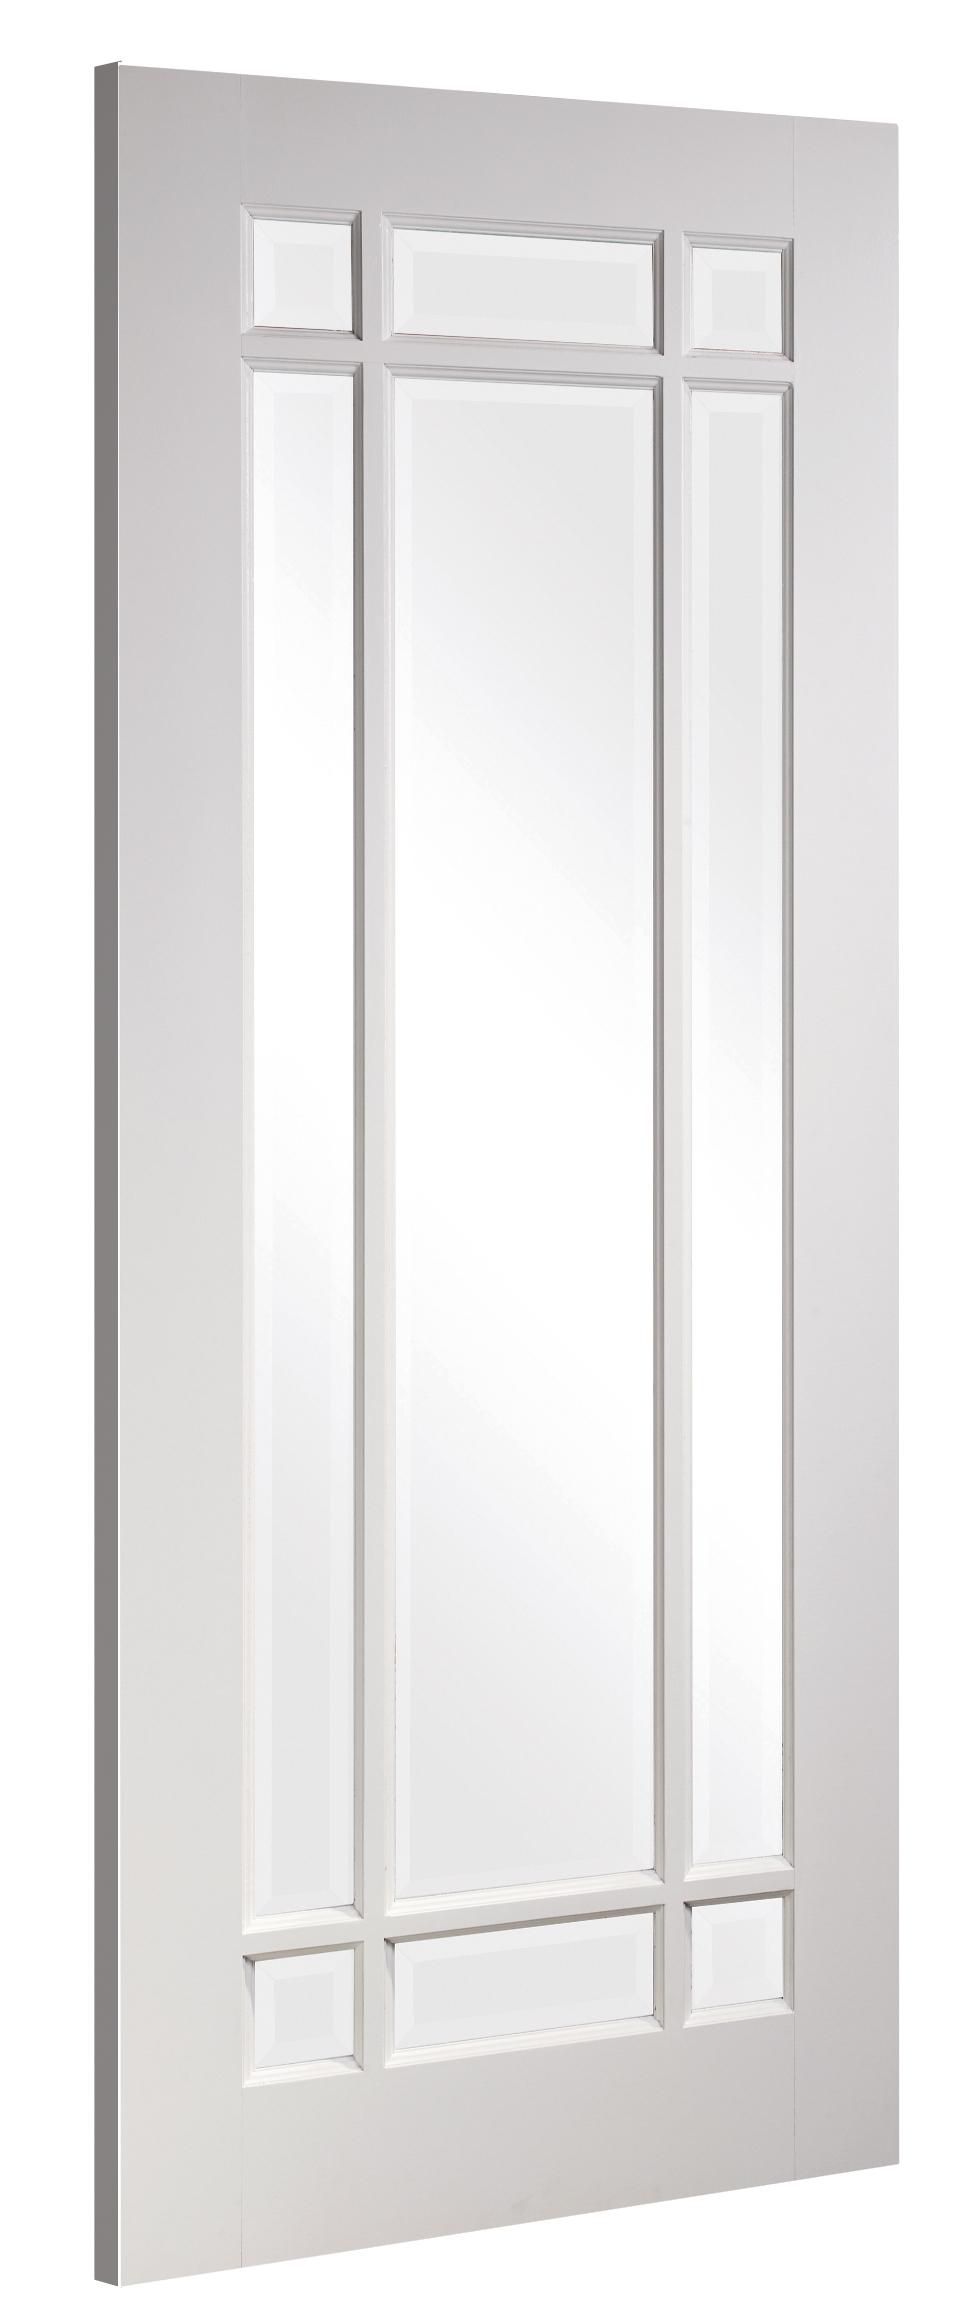 Primed Doors NM5GB